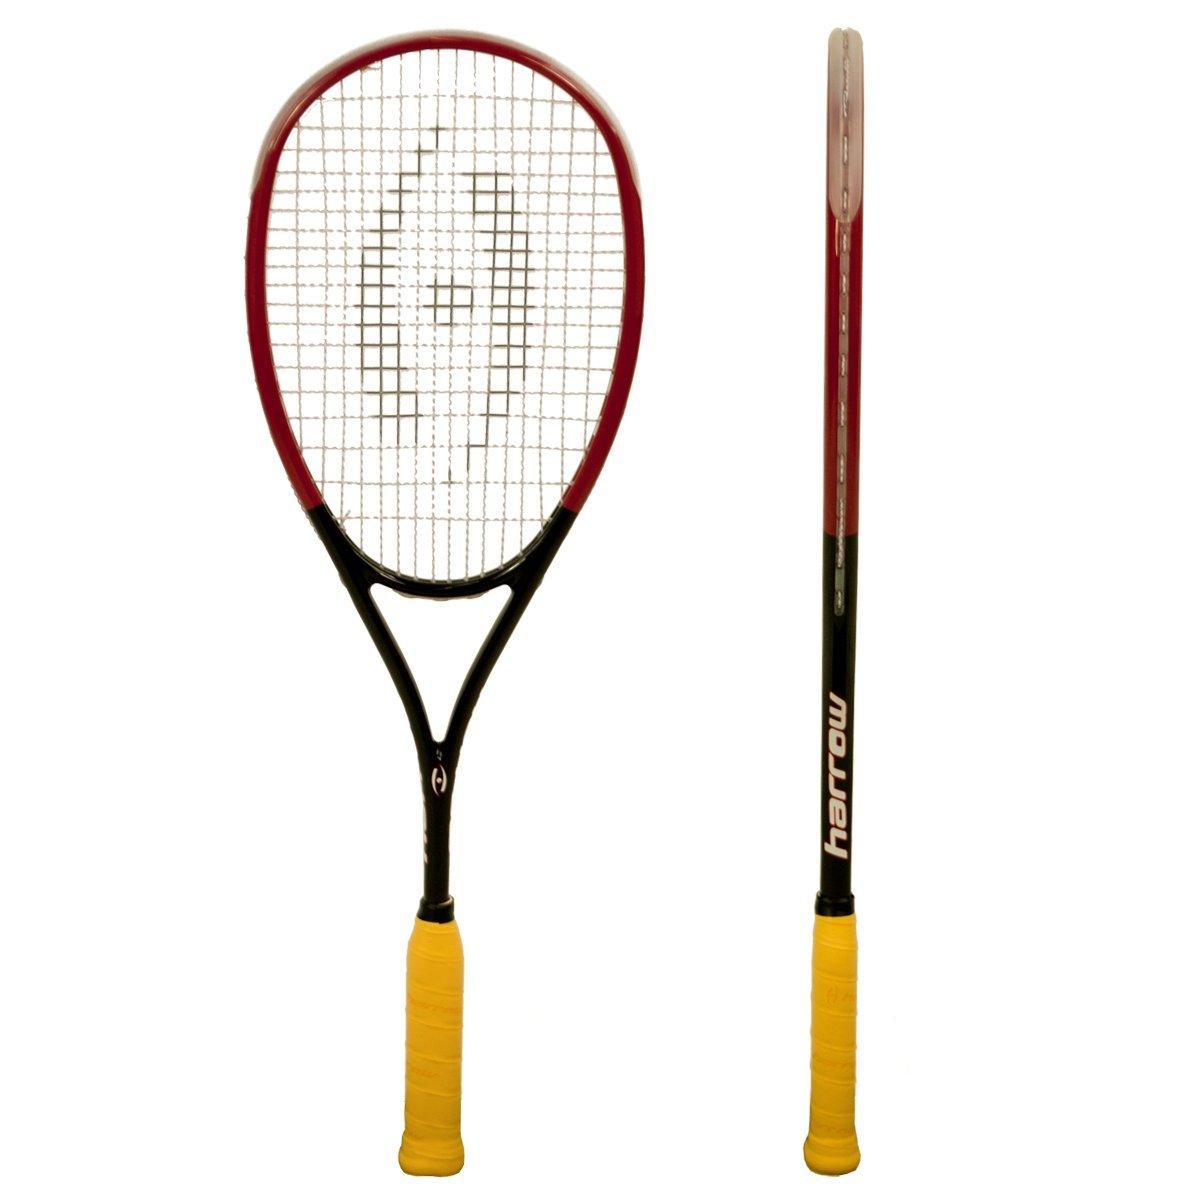 Harrow 65920502 2016 M-140 Squash Racquet, Black/Red/White by Harrow